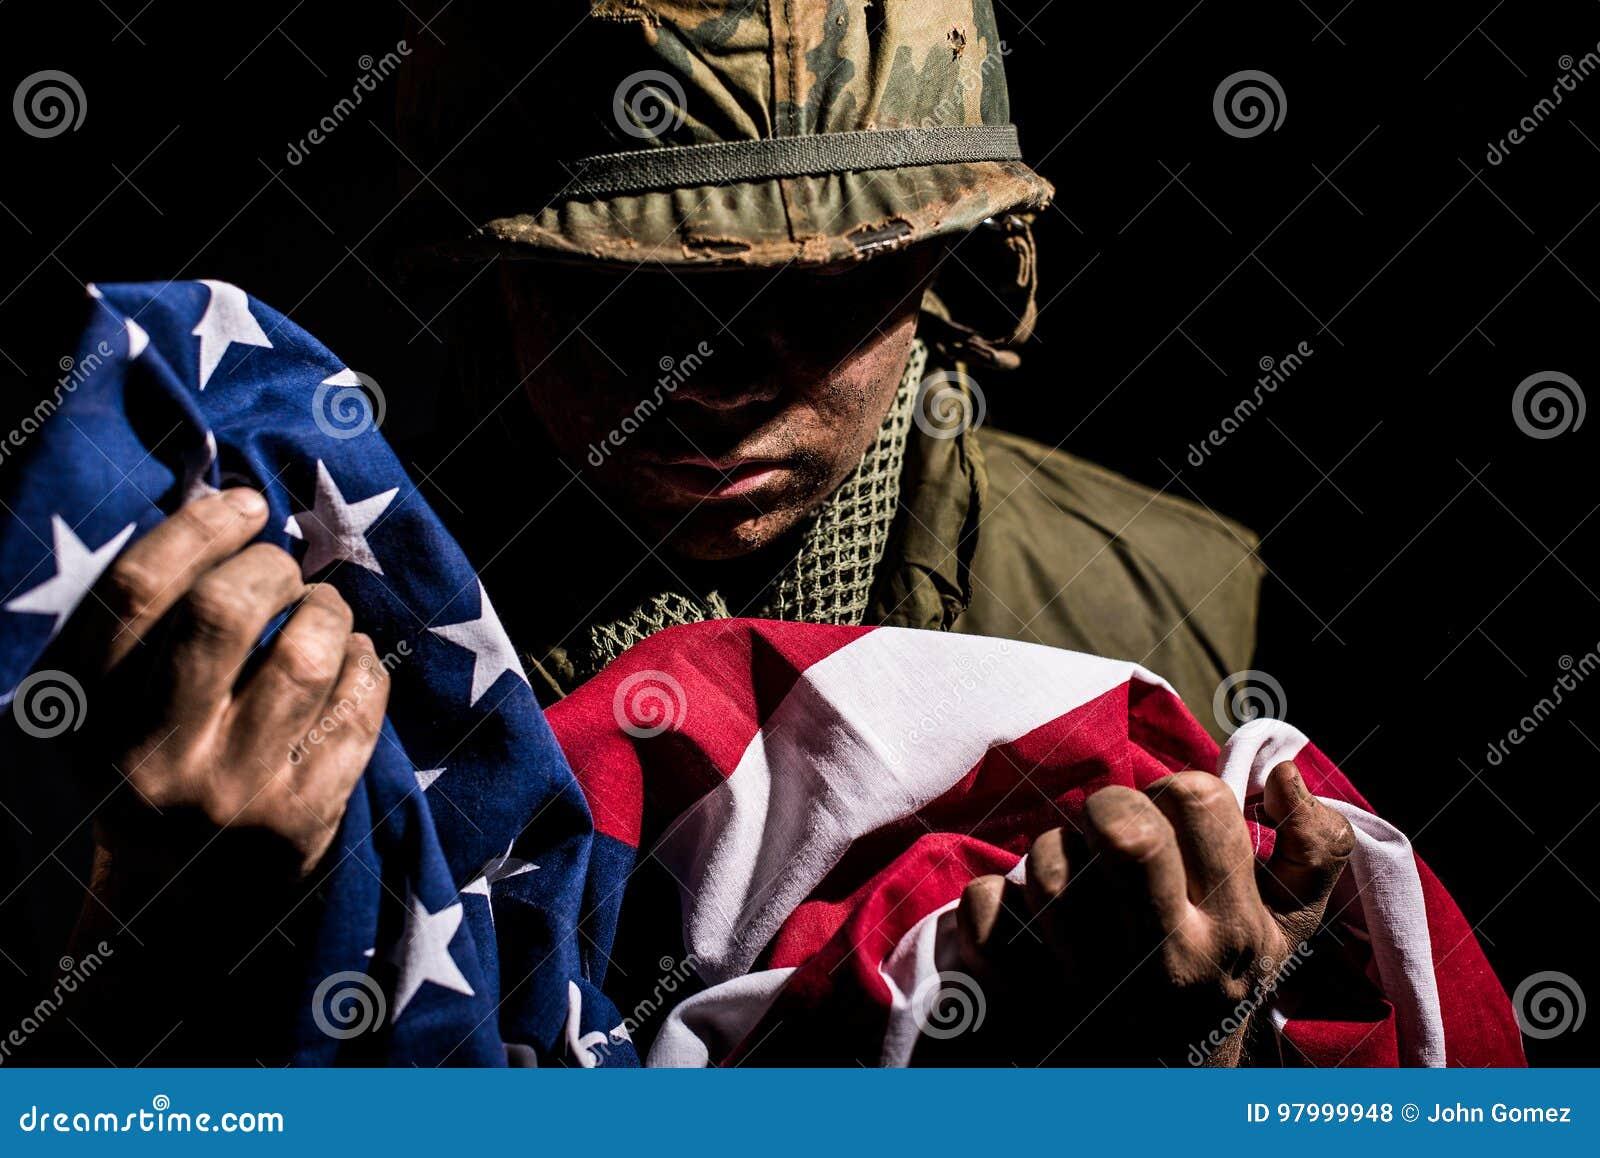 US Marine Vietnam War holding American flag.